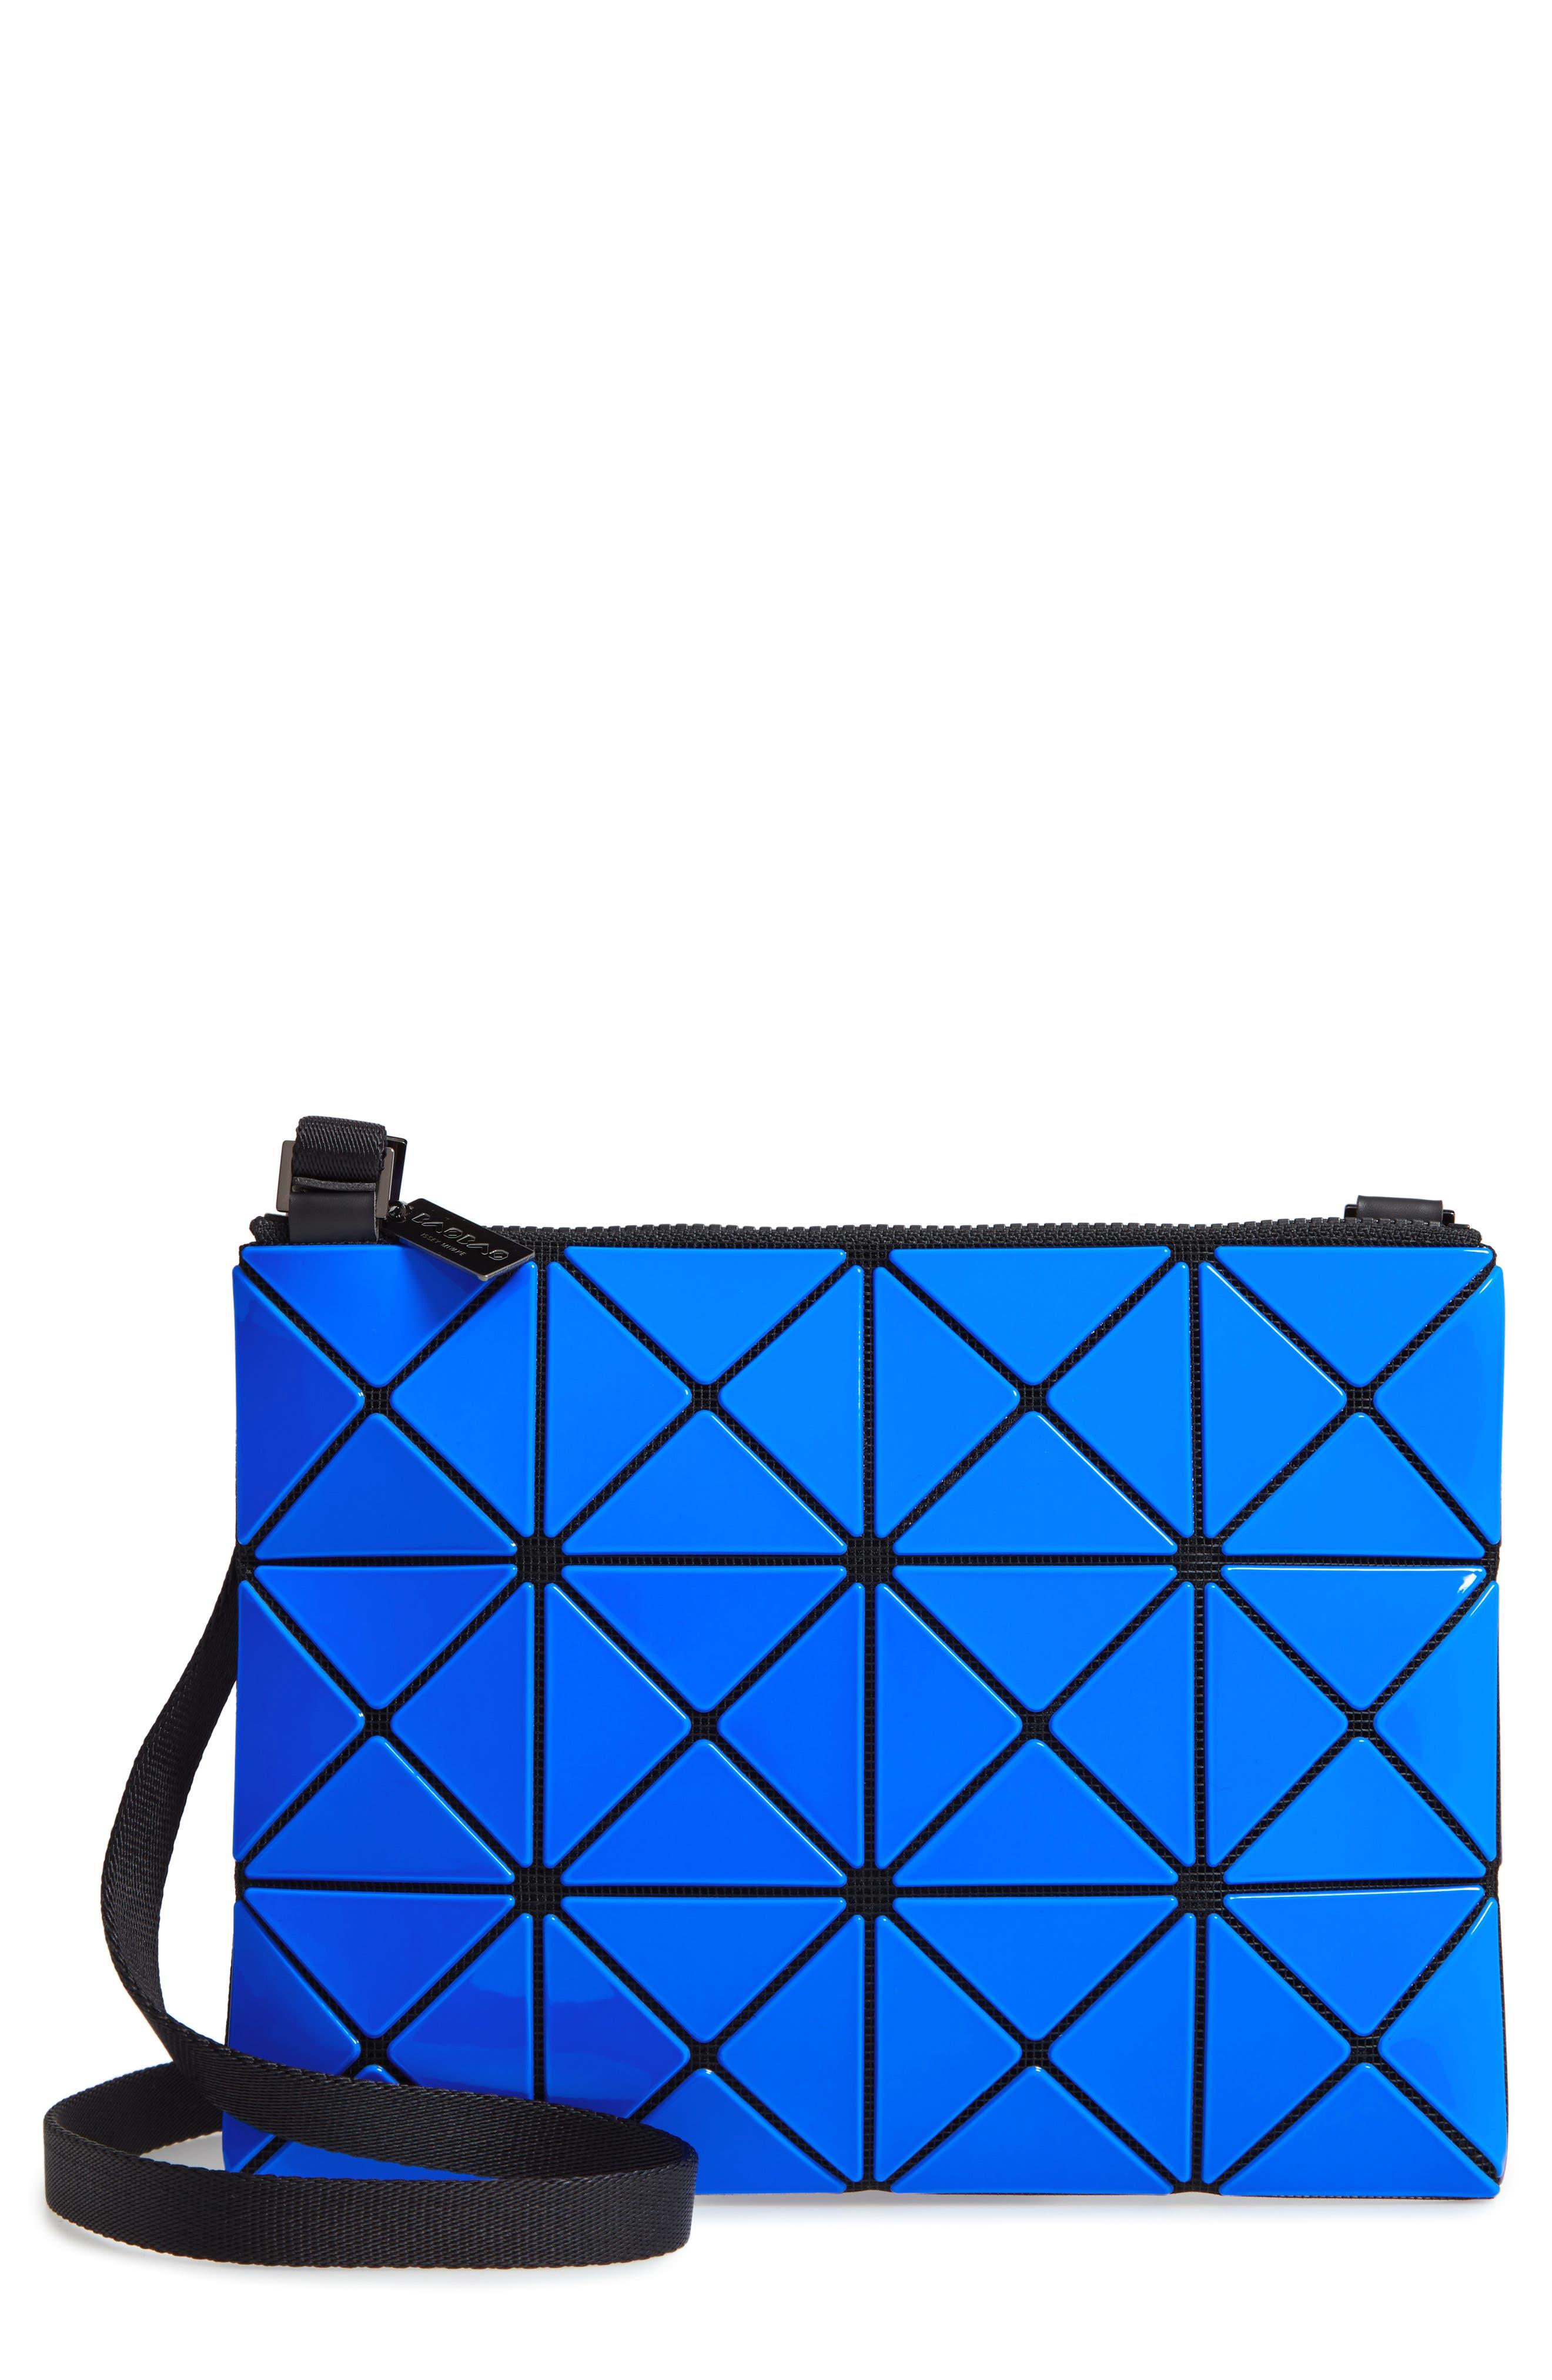 Lucent Two-Tone Crossbody Bag,                         Main,                         color, Blue/ Dark Blue